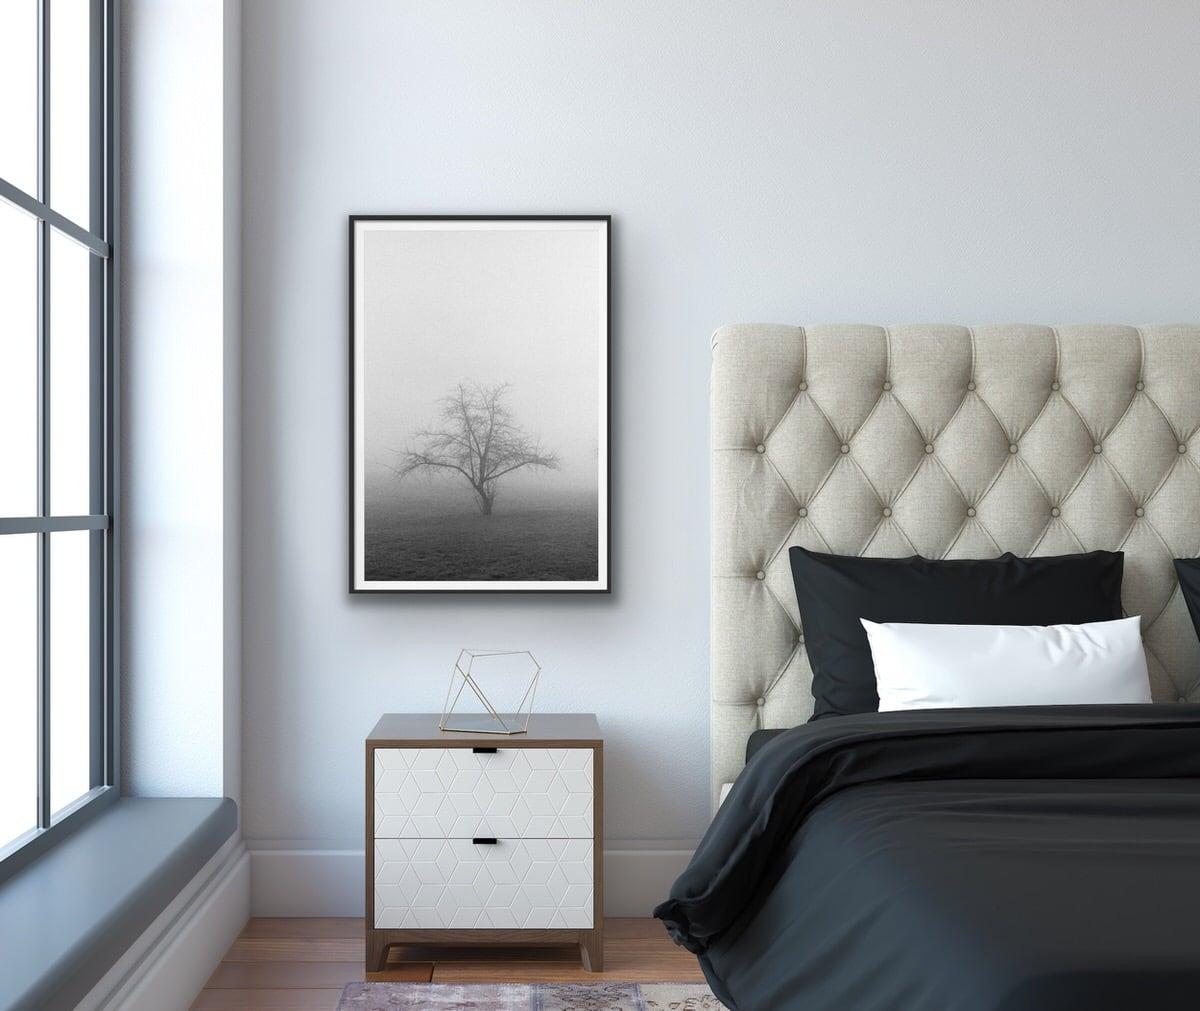 Black-and-white-fine-art-film-photography-wall-decor-by-emerging-artist-Studio-L-photographer-Laura-Schneider-_4903